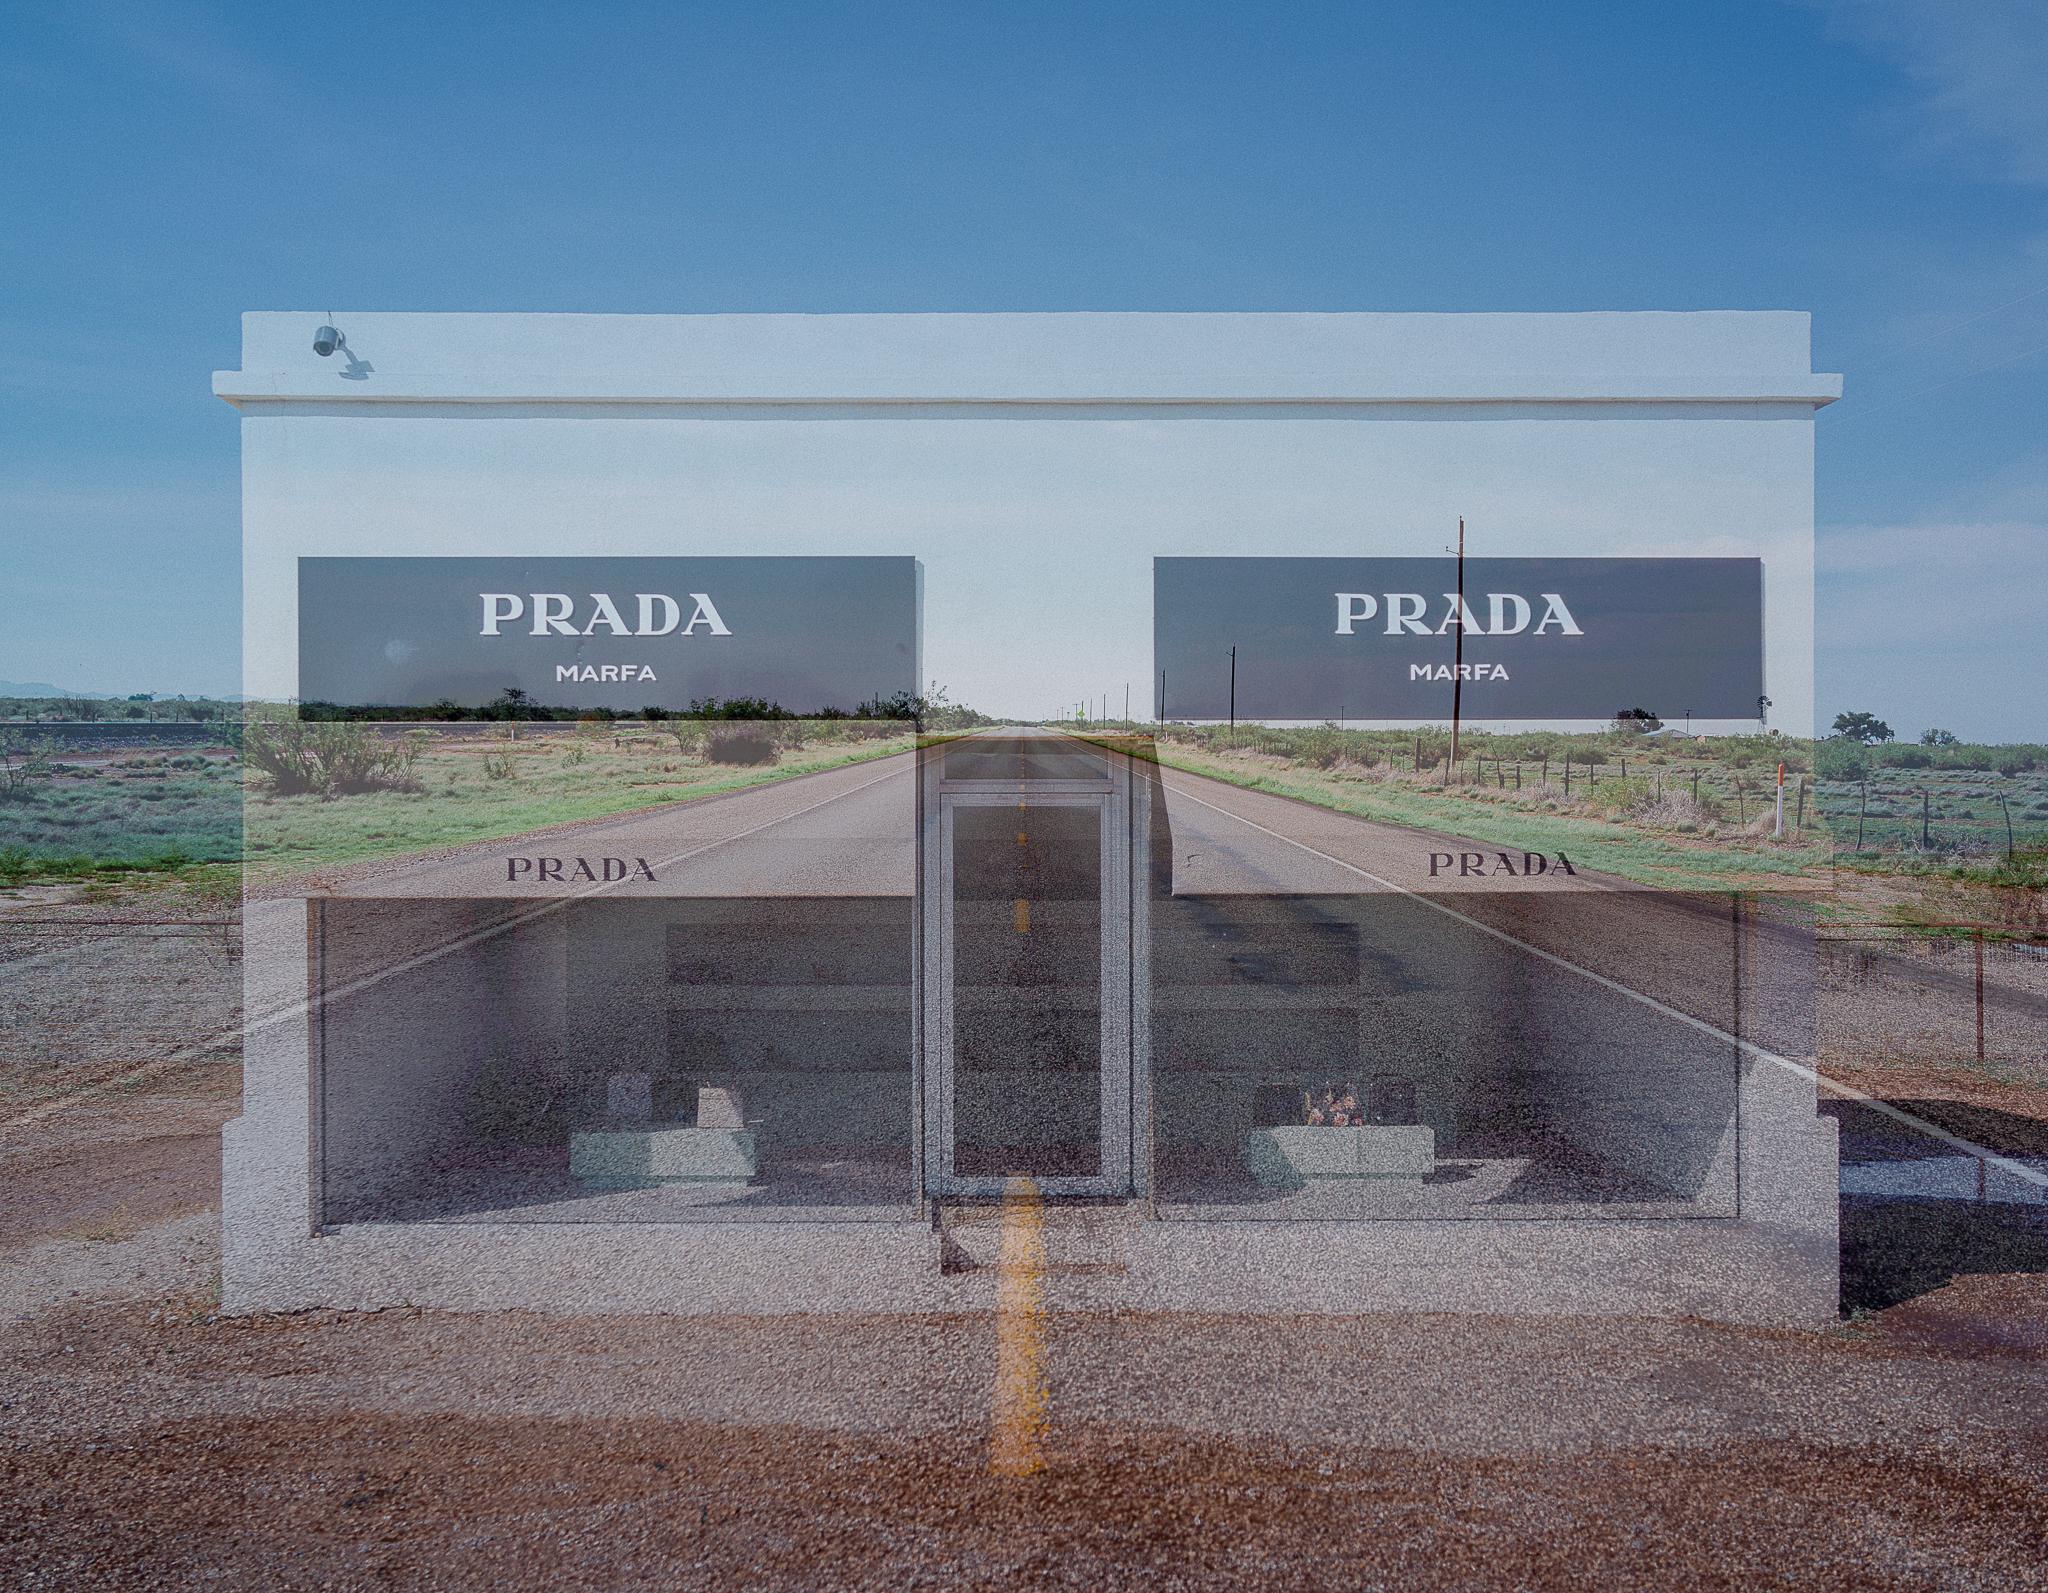 One Frame: PradaMarfa